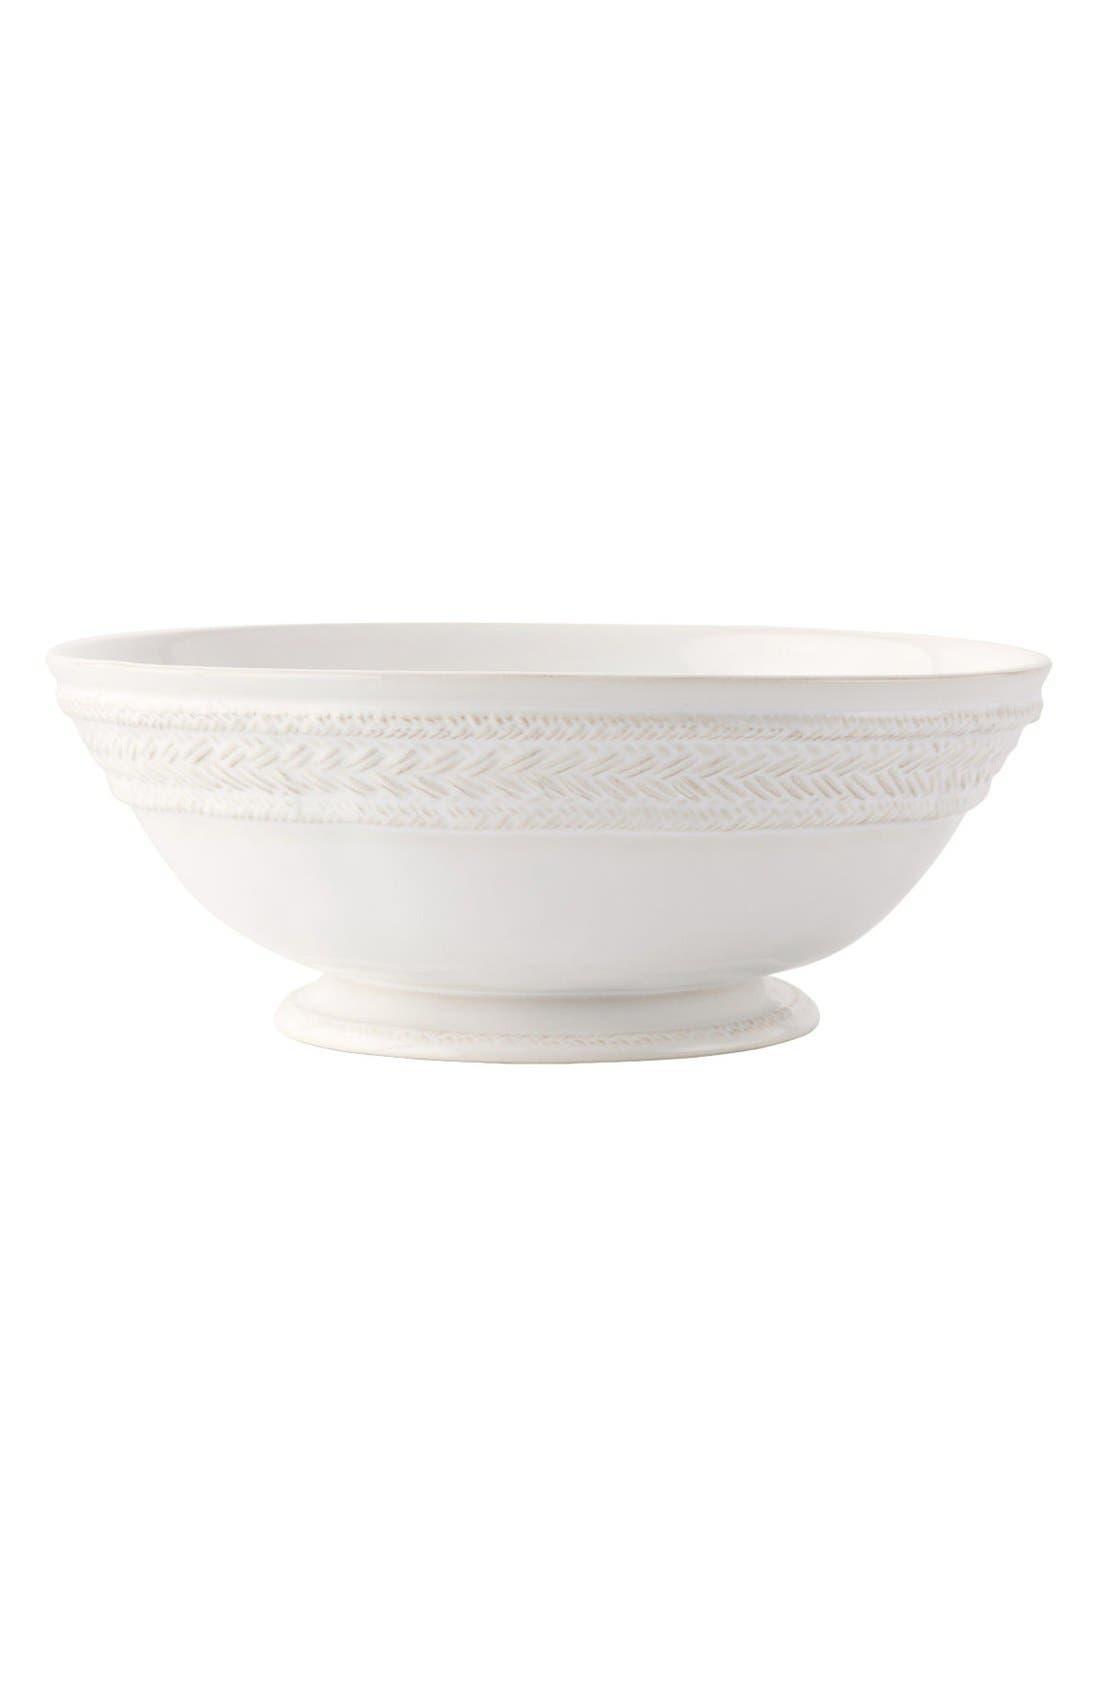 JULISKA Le Panier Ceramic Fruit Bowl